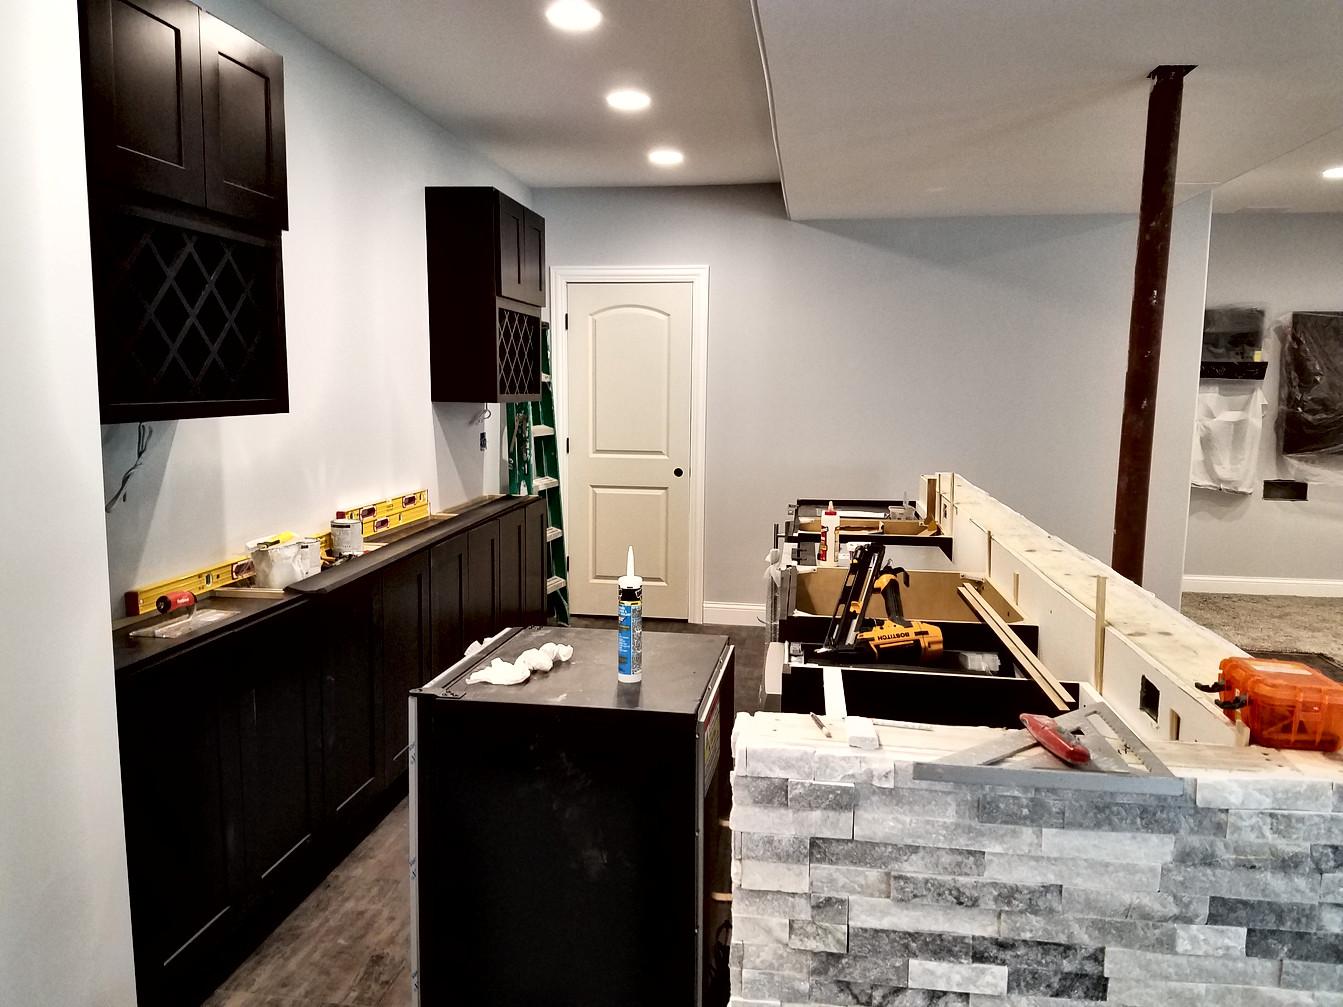 Bar Mid-Construction